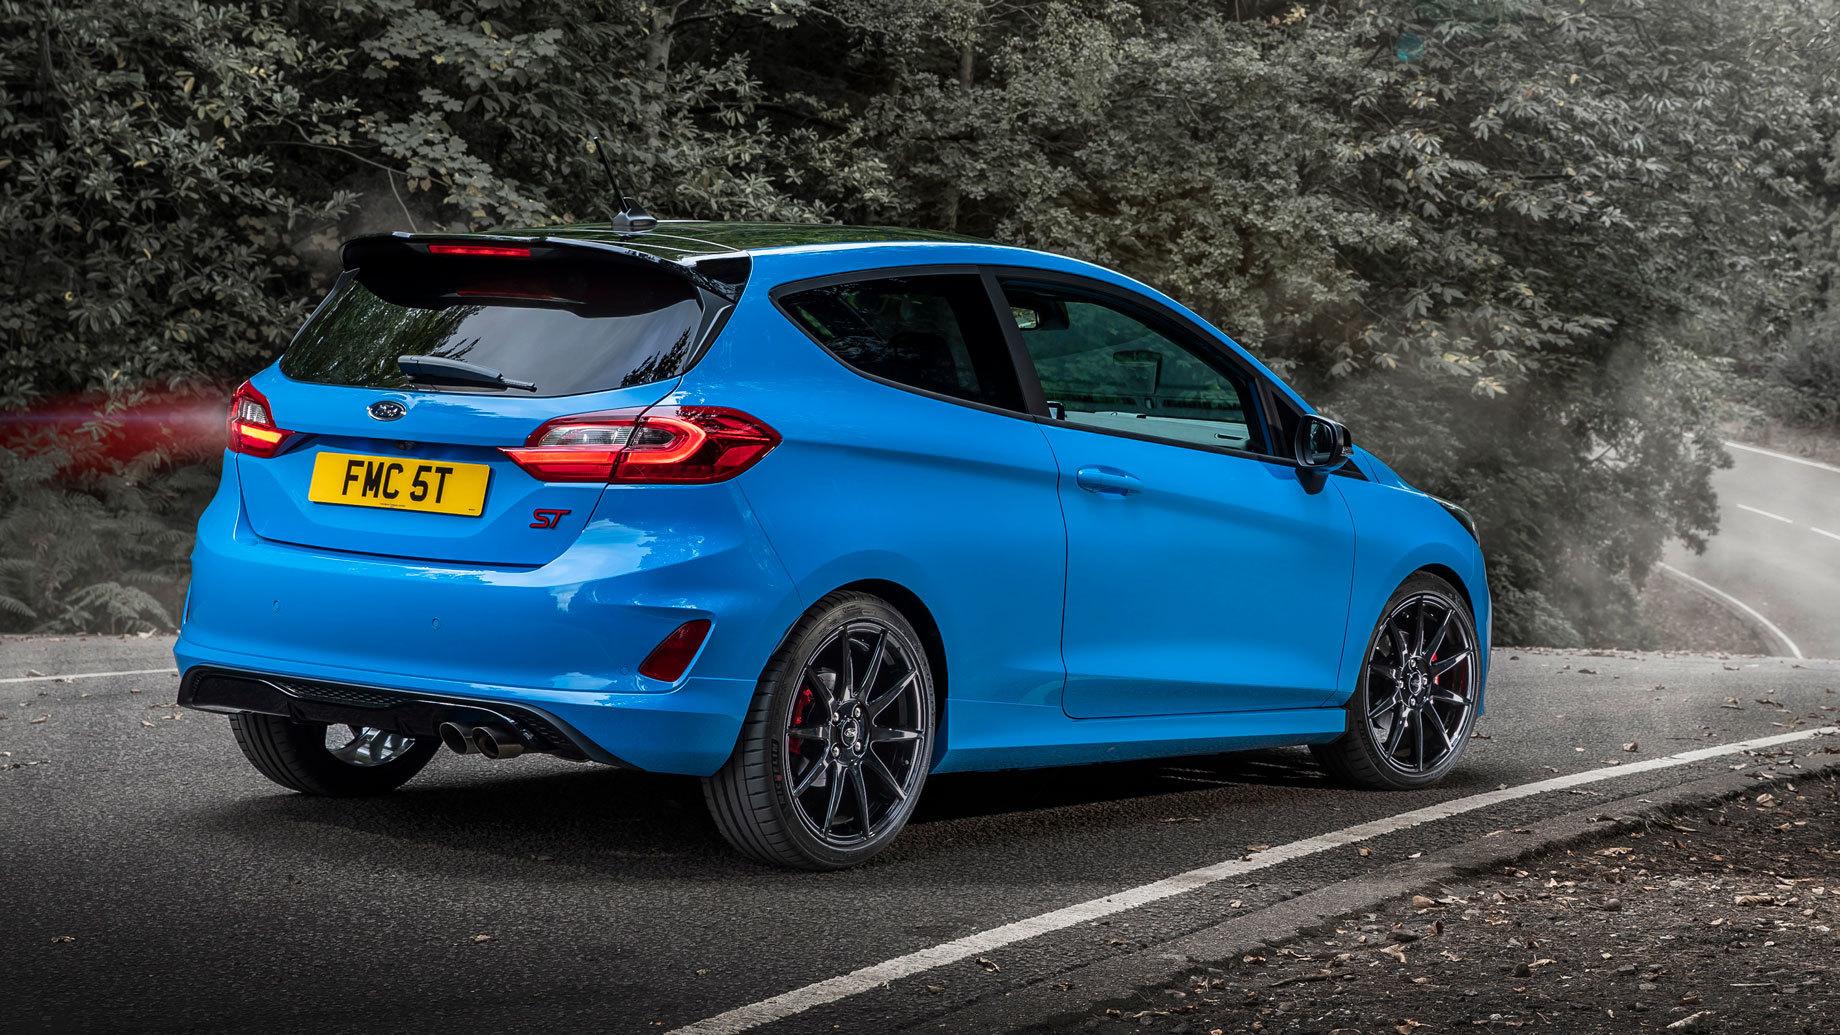 Ford выпустил лимитированную серию Fiesta ST Edition